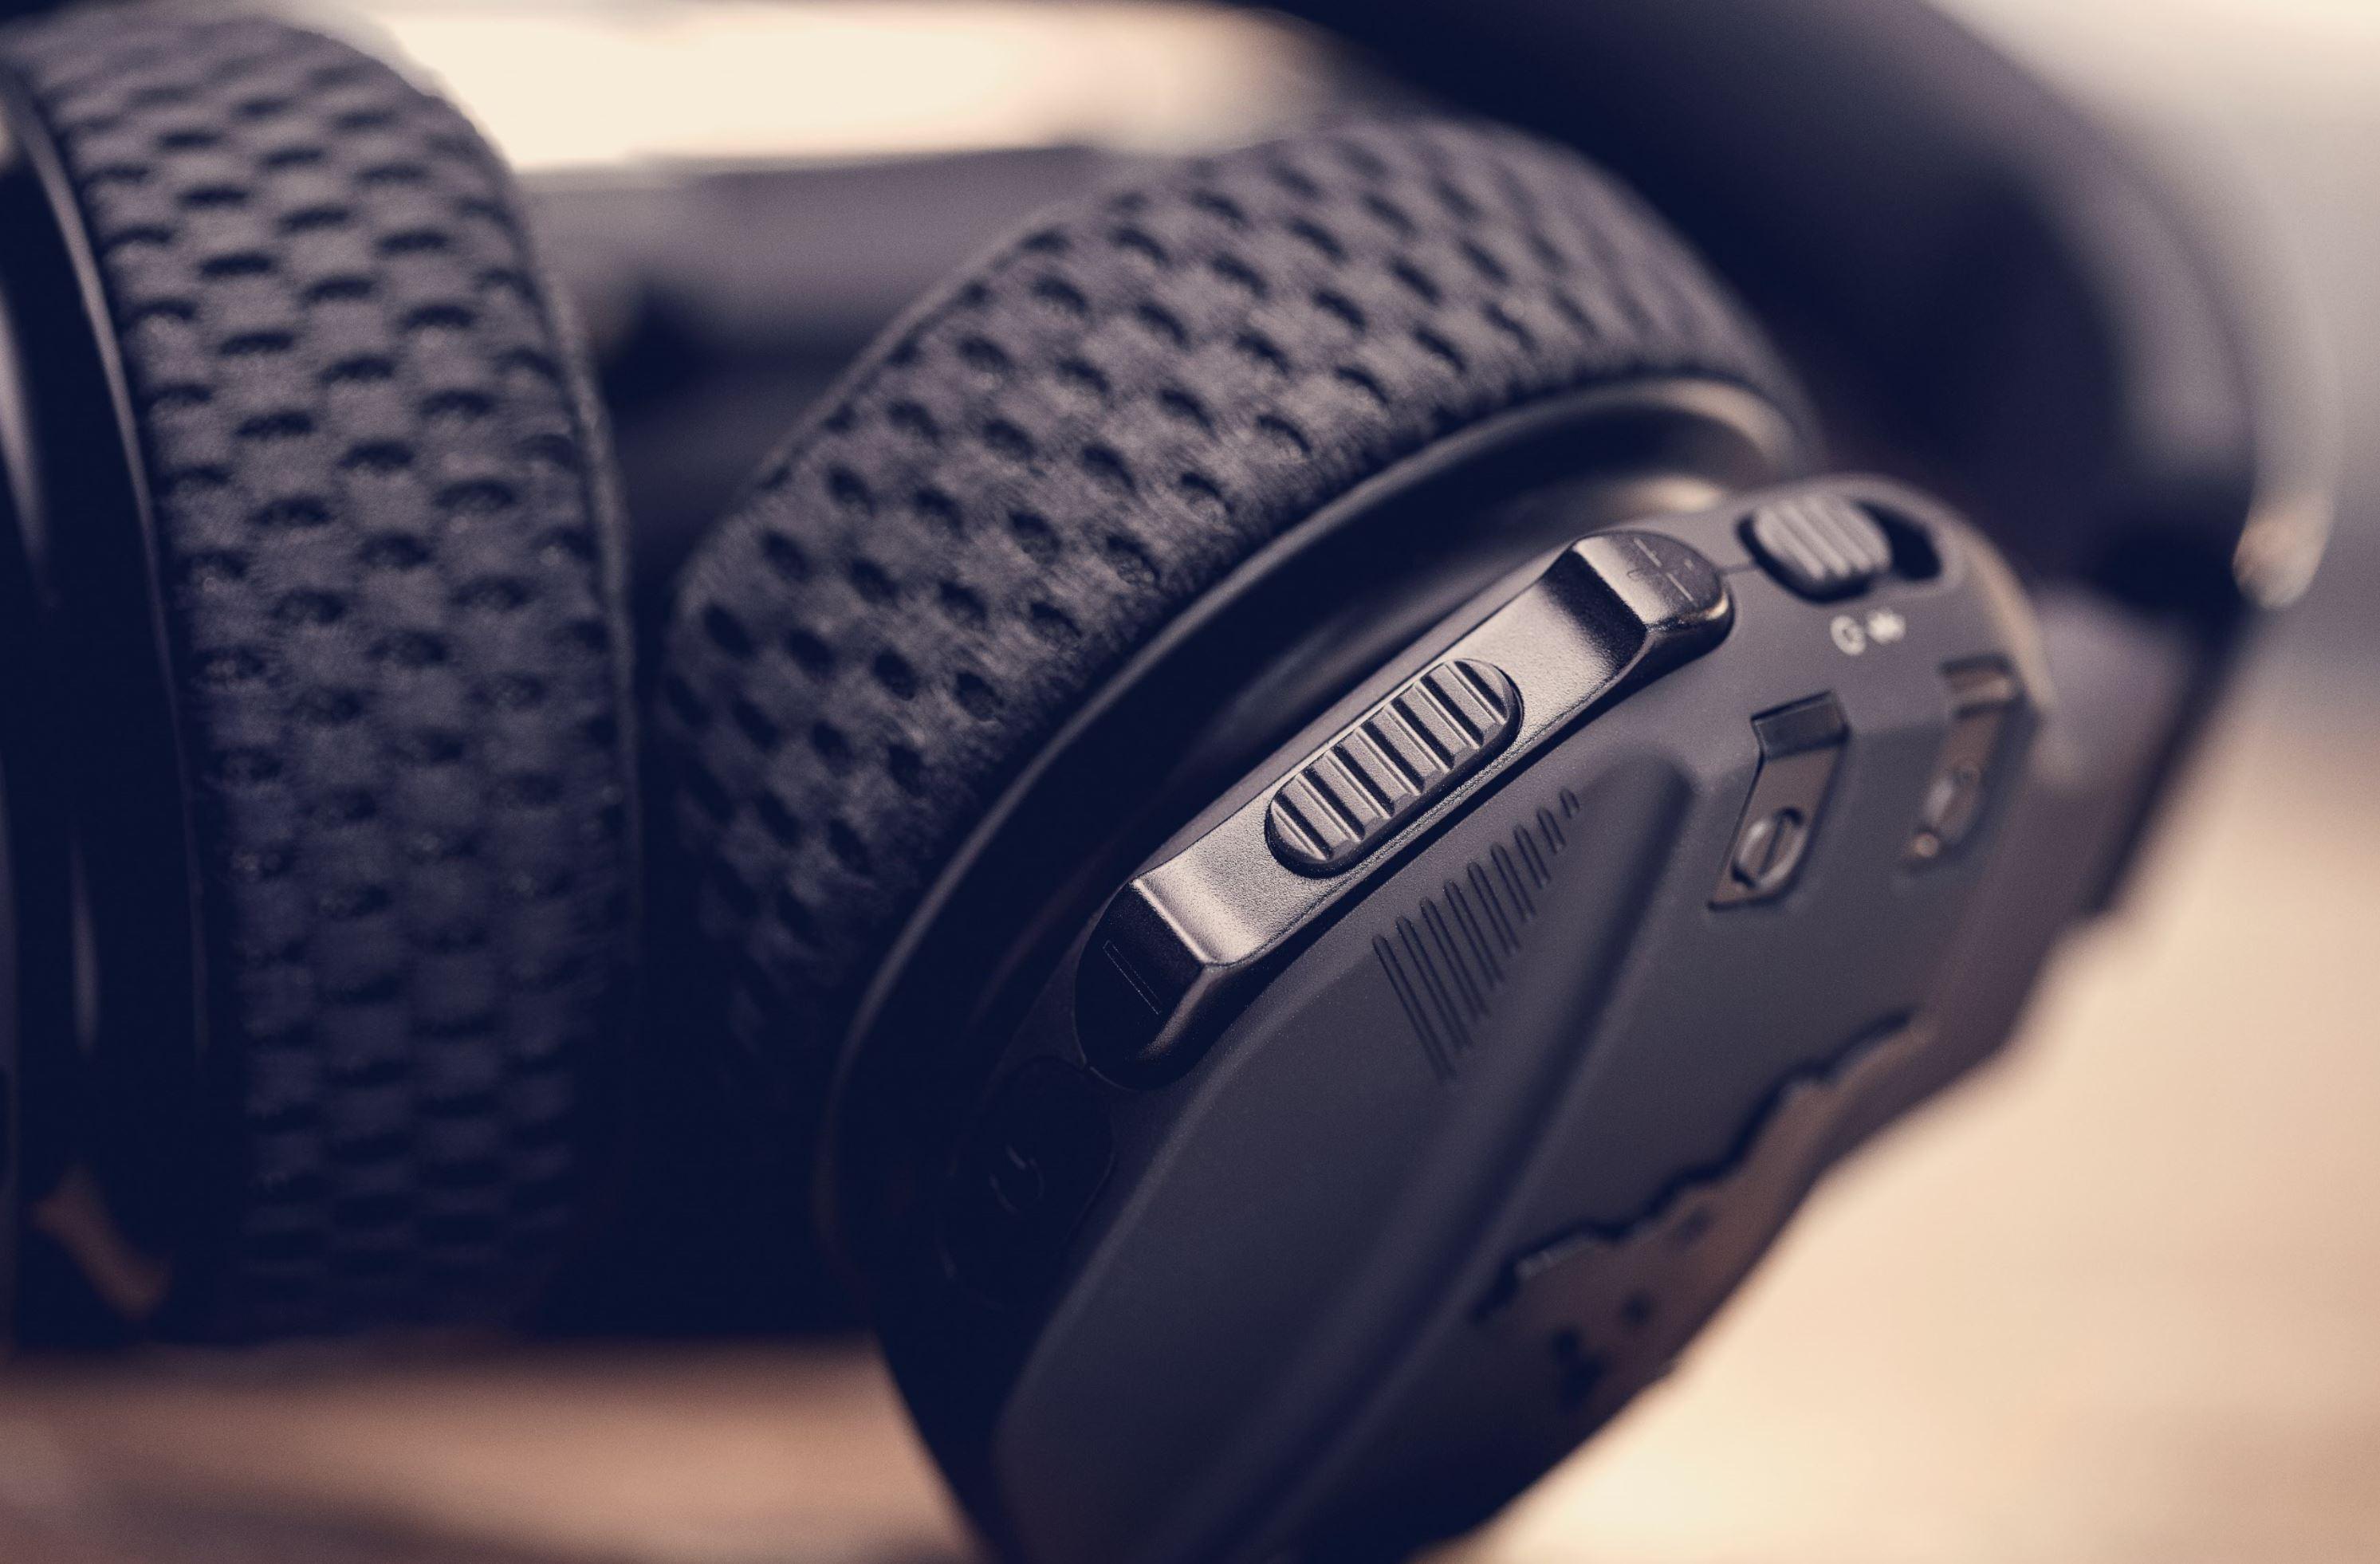 Jbl bluetooth headphones wireless - bluetooth headphones gym jbl